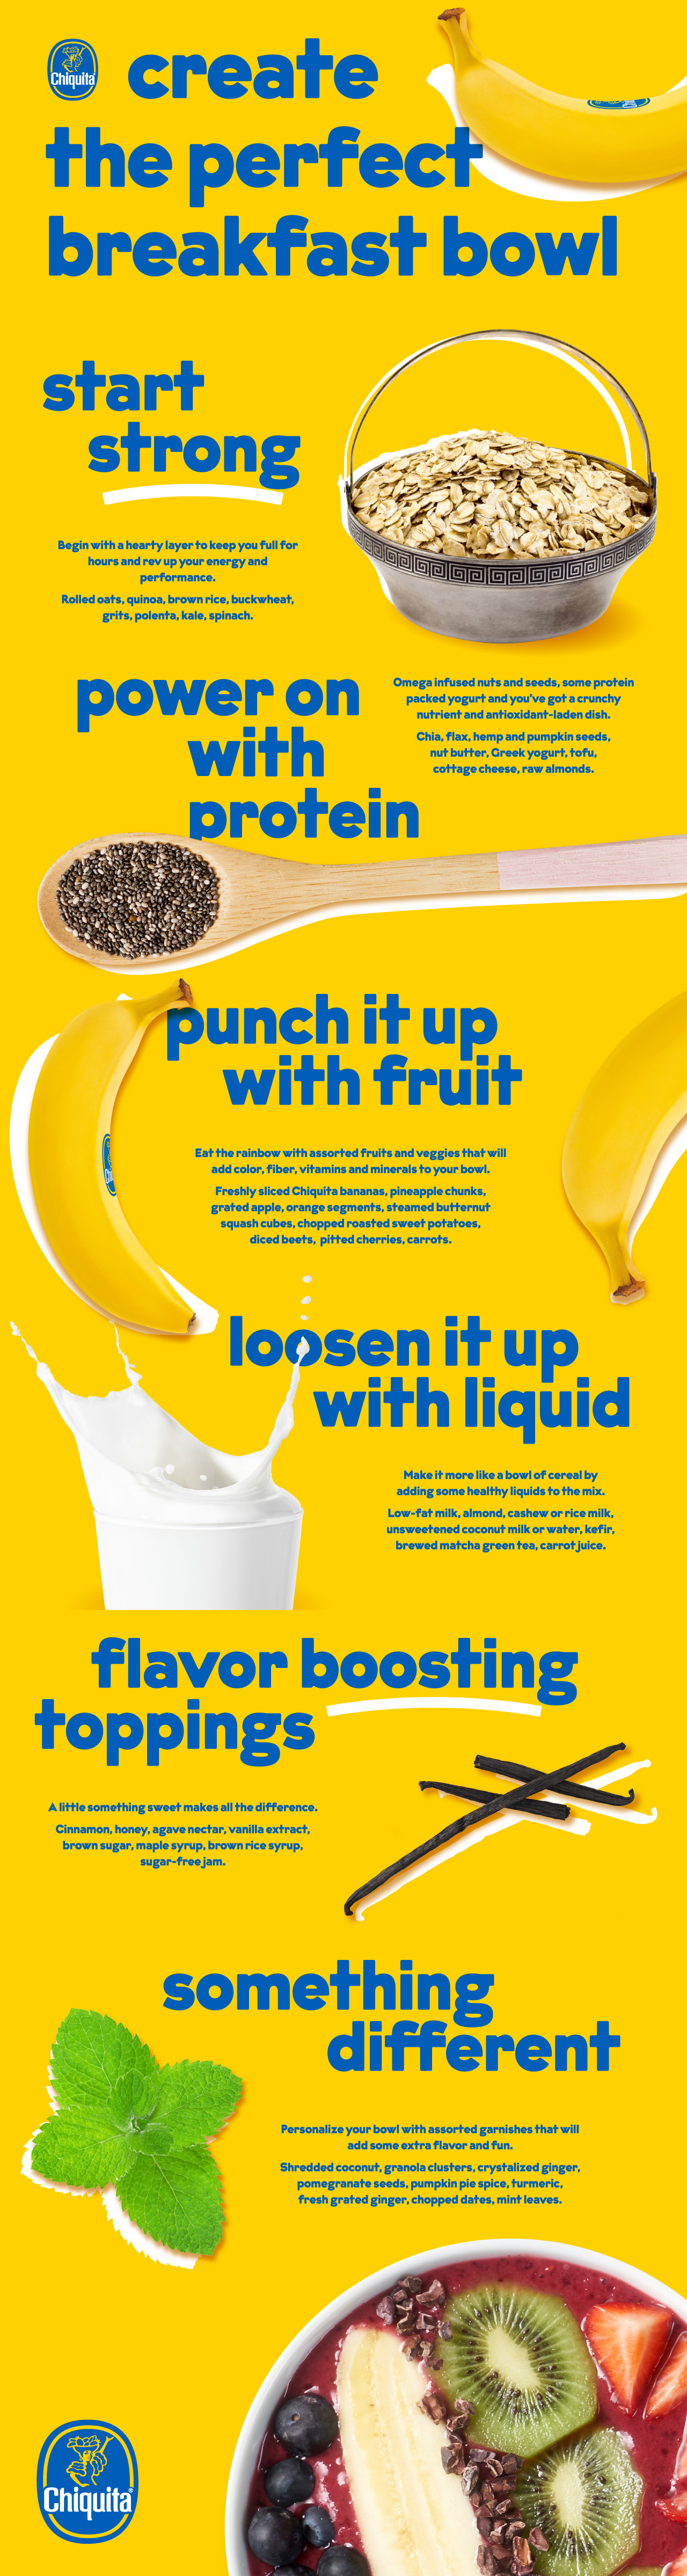 Chiquita-IG-breakfast-krana-1.22 (1) (1).jpg